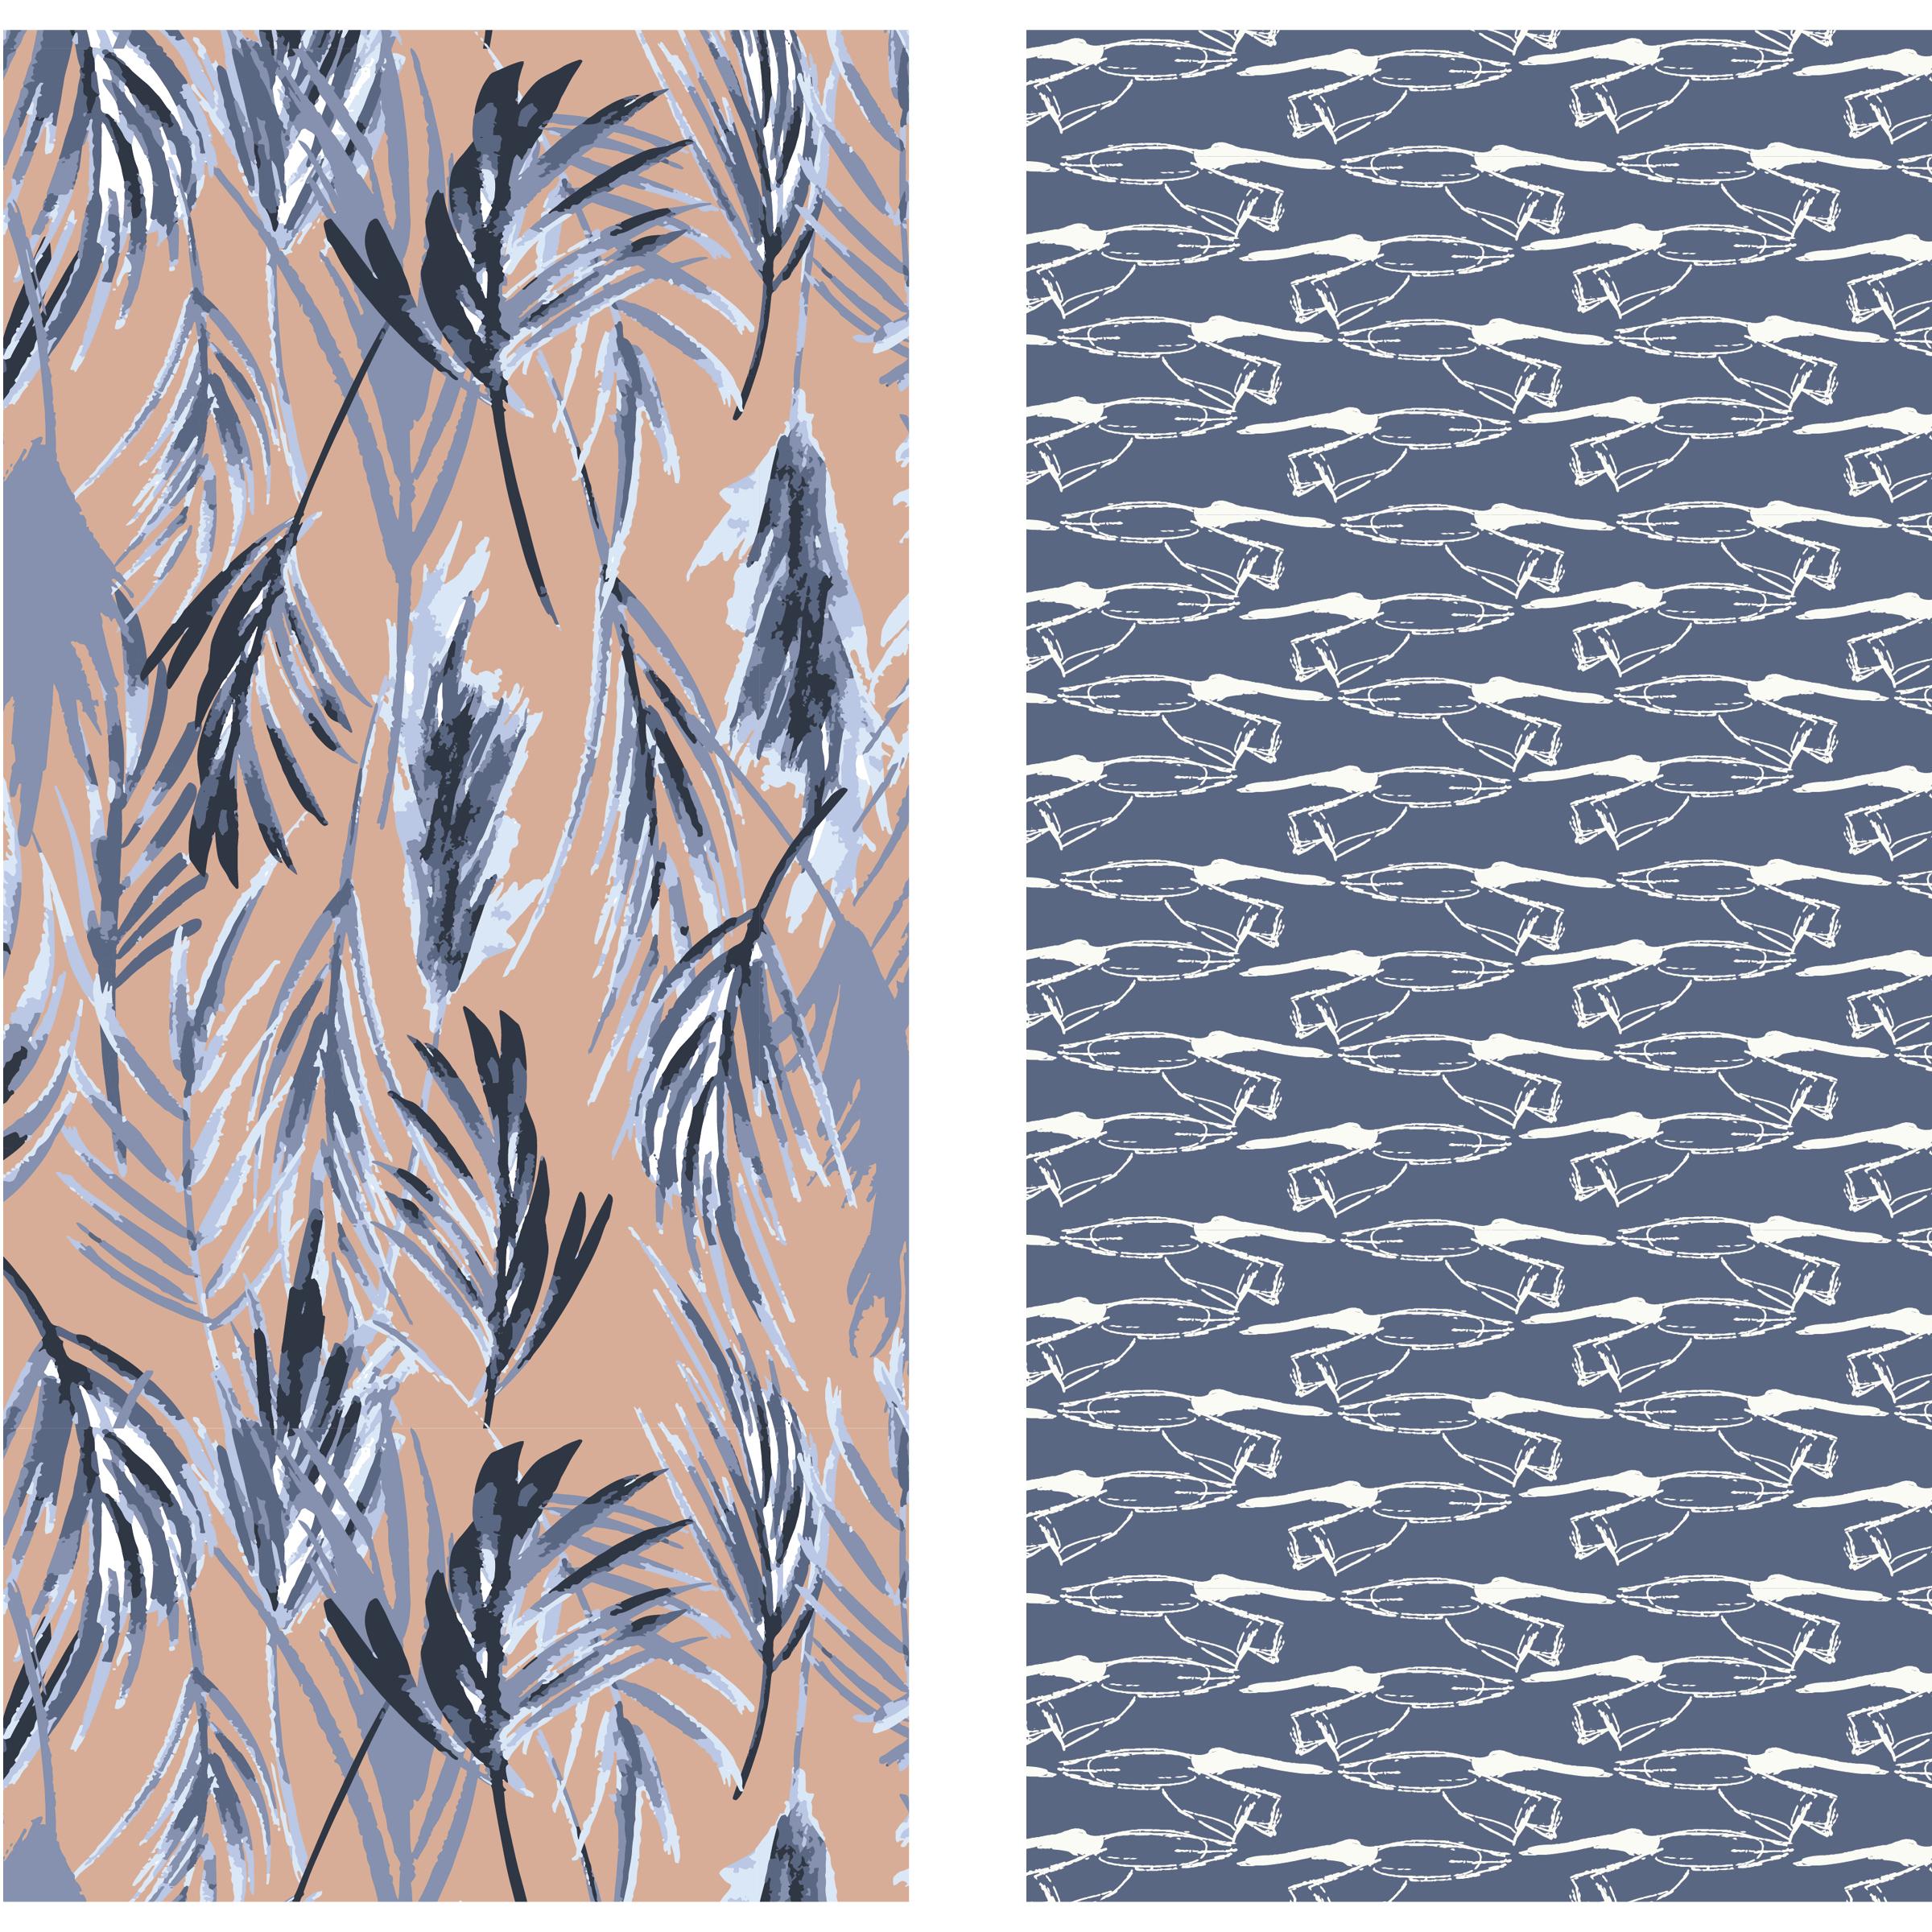 by HOPE johnson surface pattern design_pattern pair6.jpg